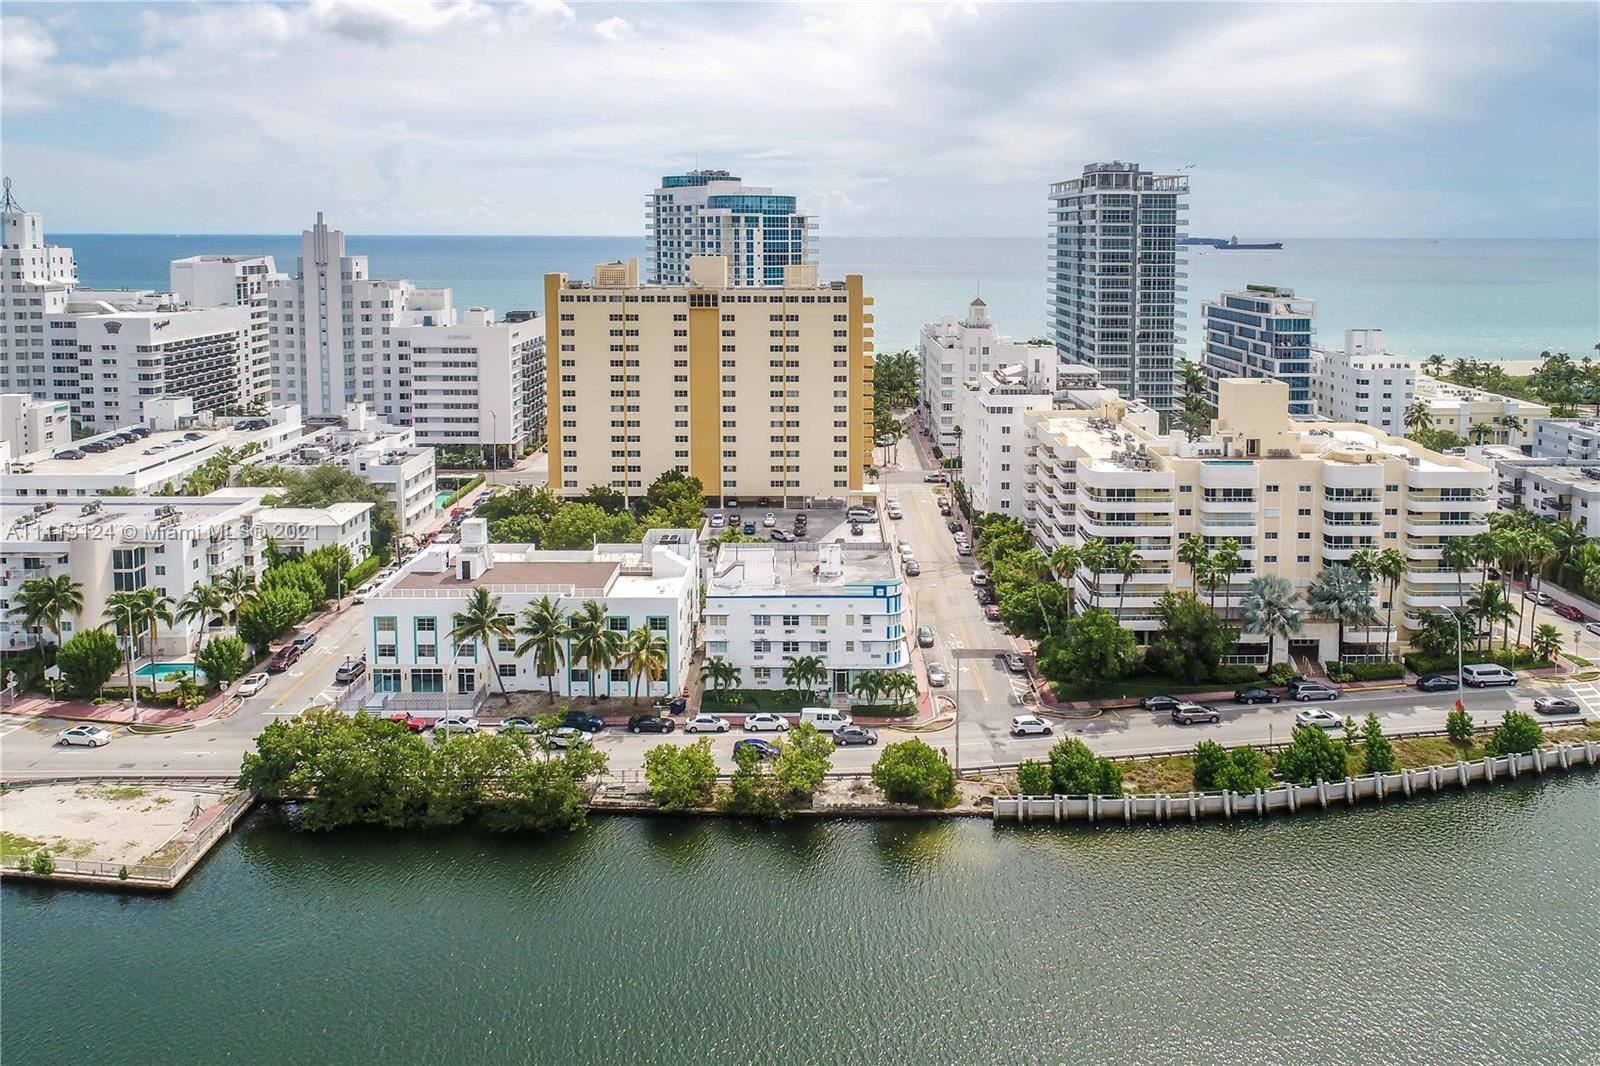 Photo of 3801 Indian Creek Dr #202, Miami Beach, FL 33140 (MLS # A11113124)